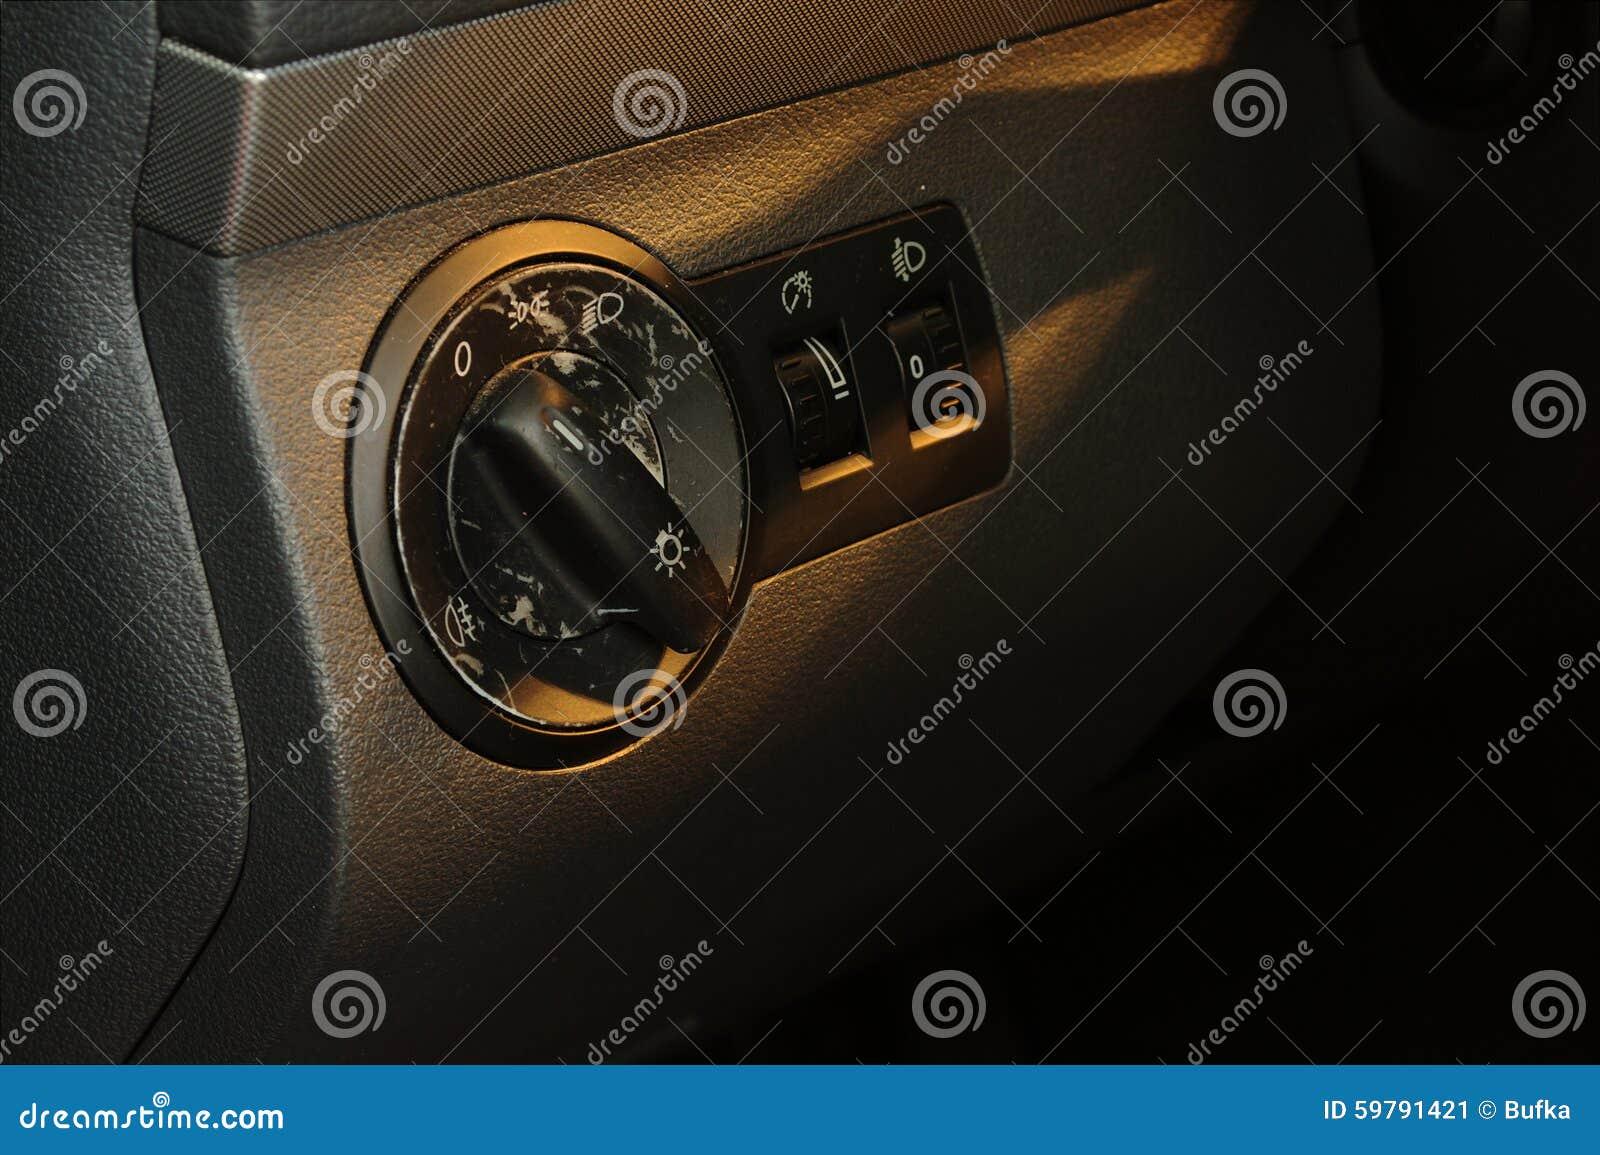 worn car interior stock photo image 59791421. Black Bedroom Furniture Sets. Home Design Ideas